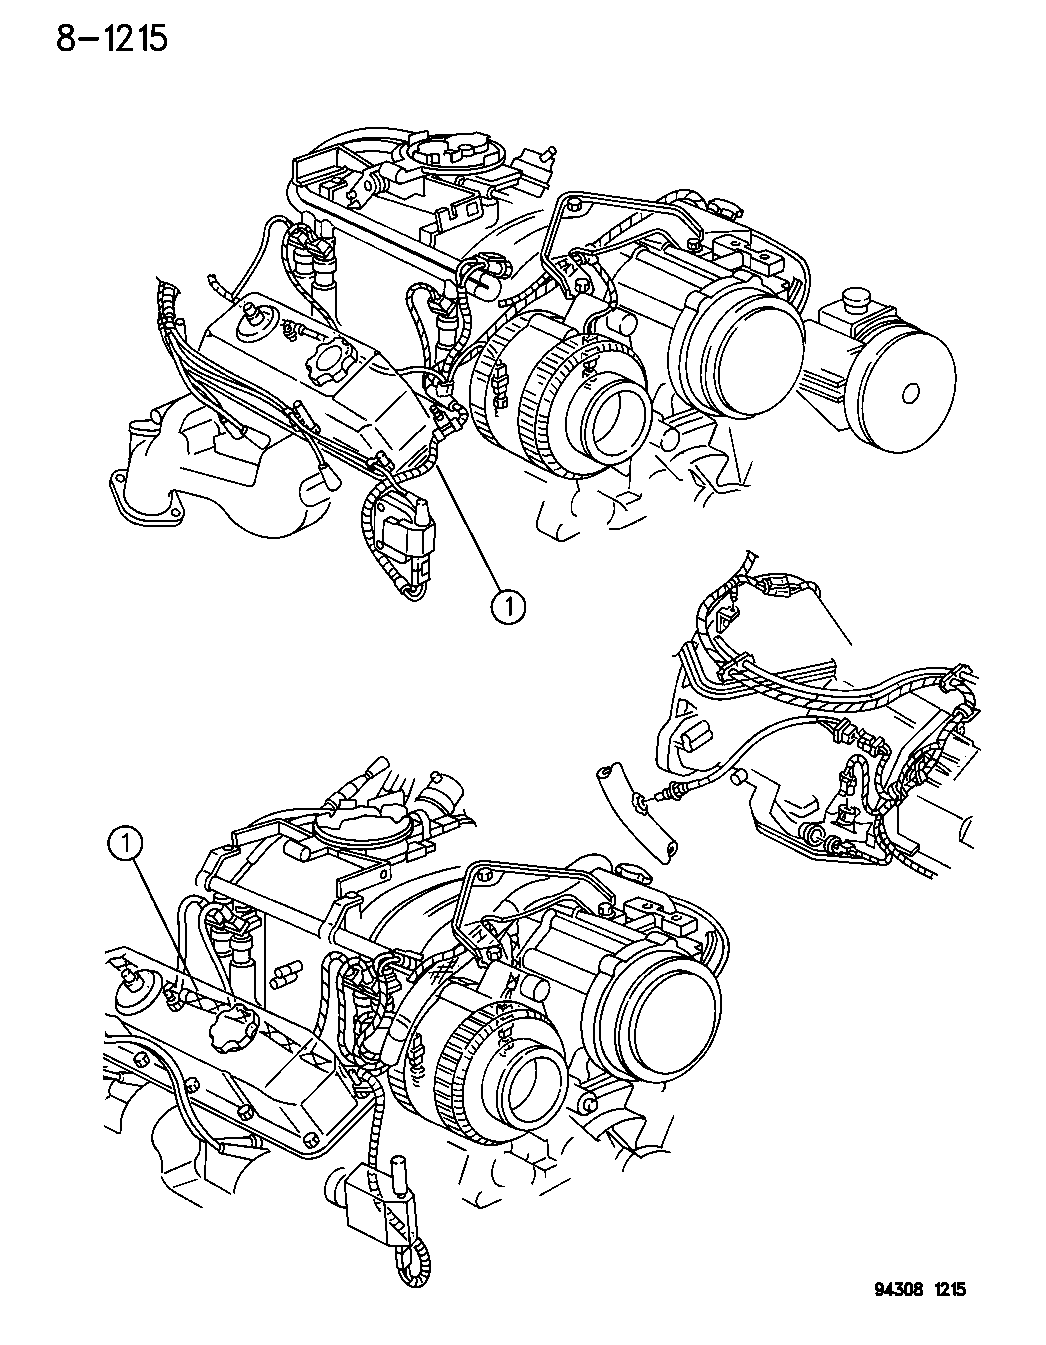 1996 Dodge Ram Van Wiring - Engine